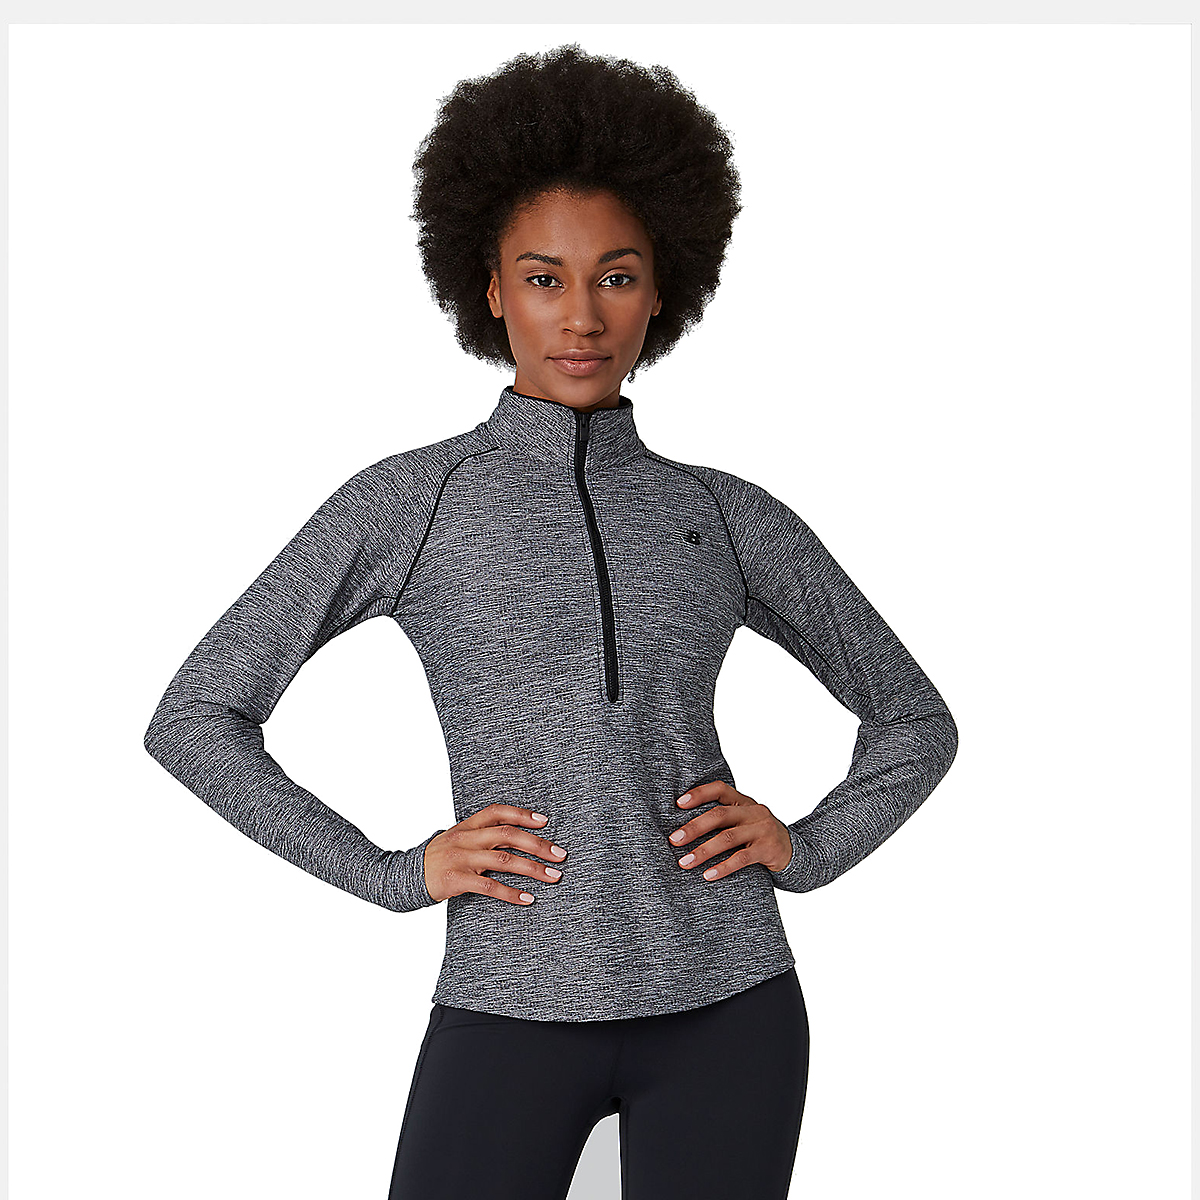 Women's New Balance Transform 1/2 Zip - Color: Black Heather - Size: XS, Black Heather, large, image 3